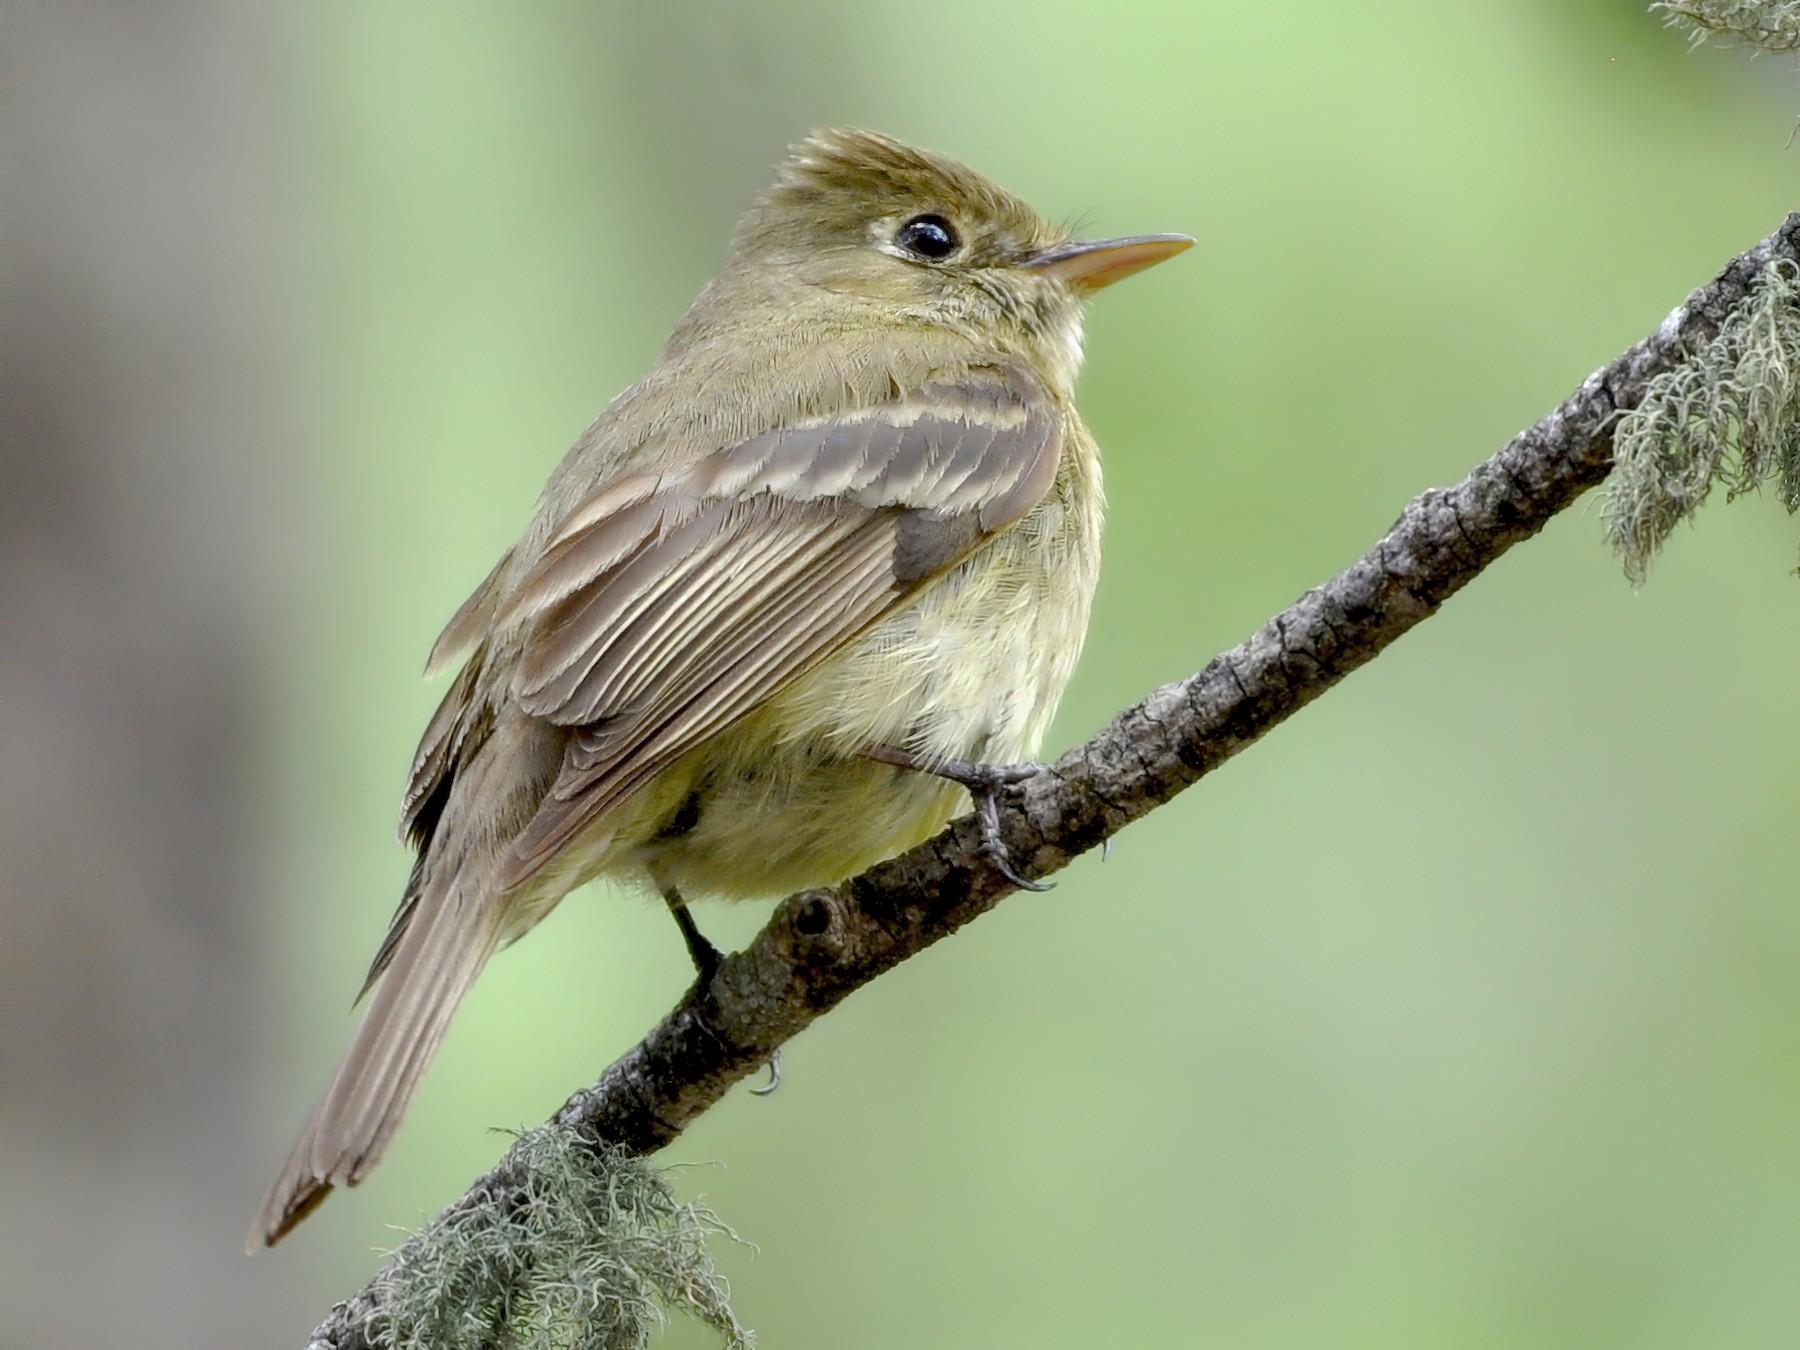 Cordilleran Flycatcher - Oliver Patrick